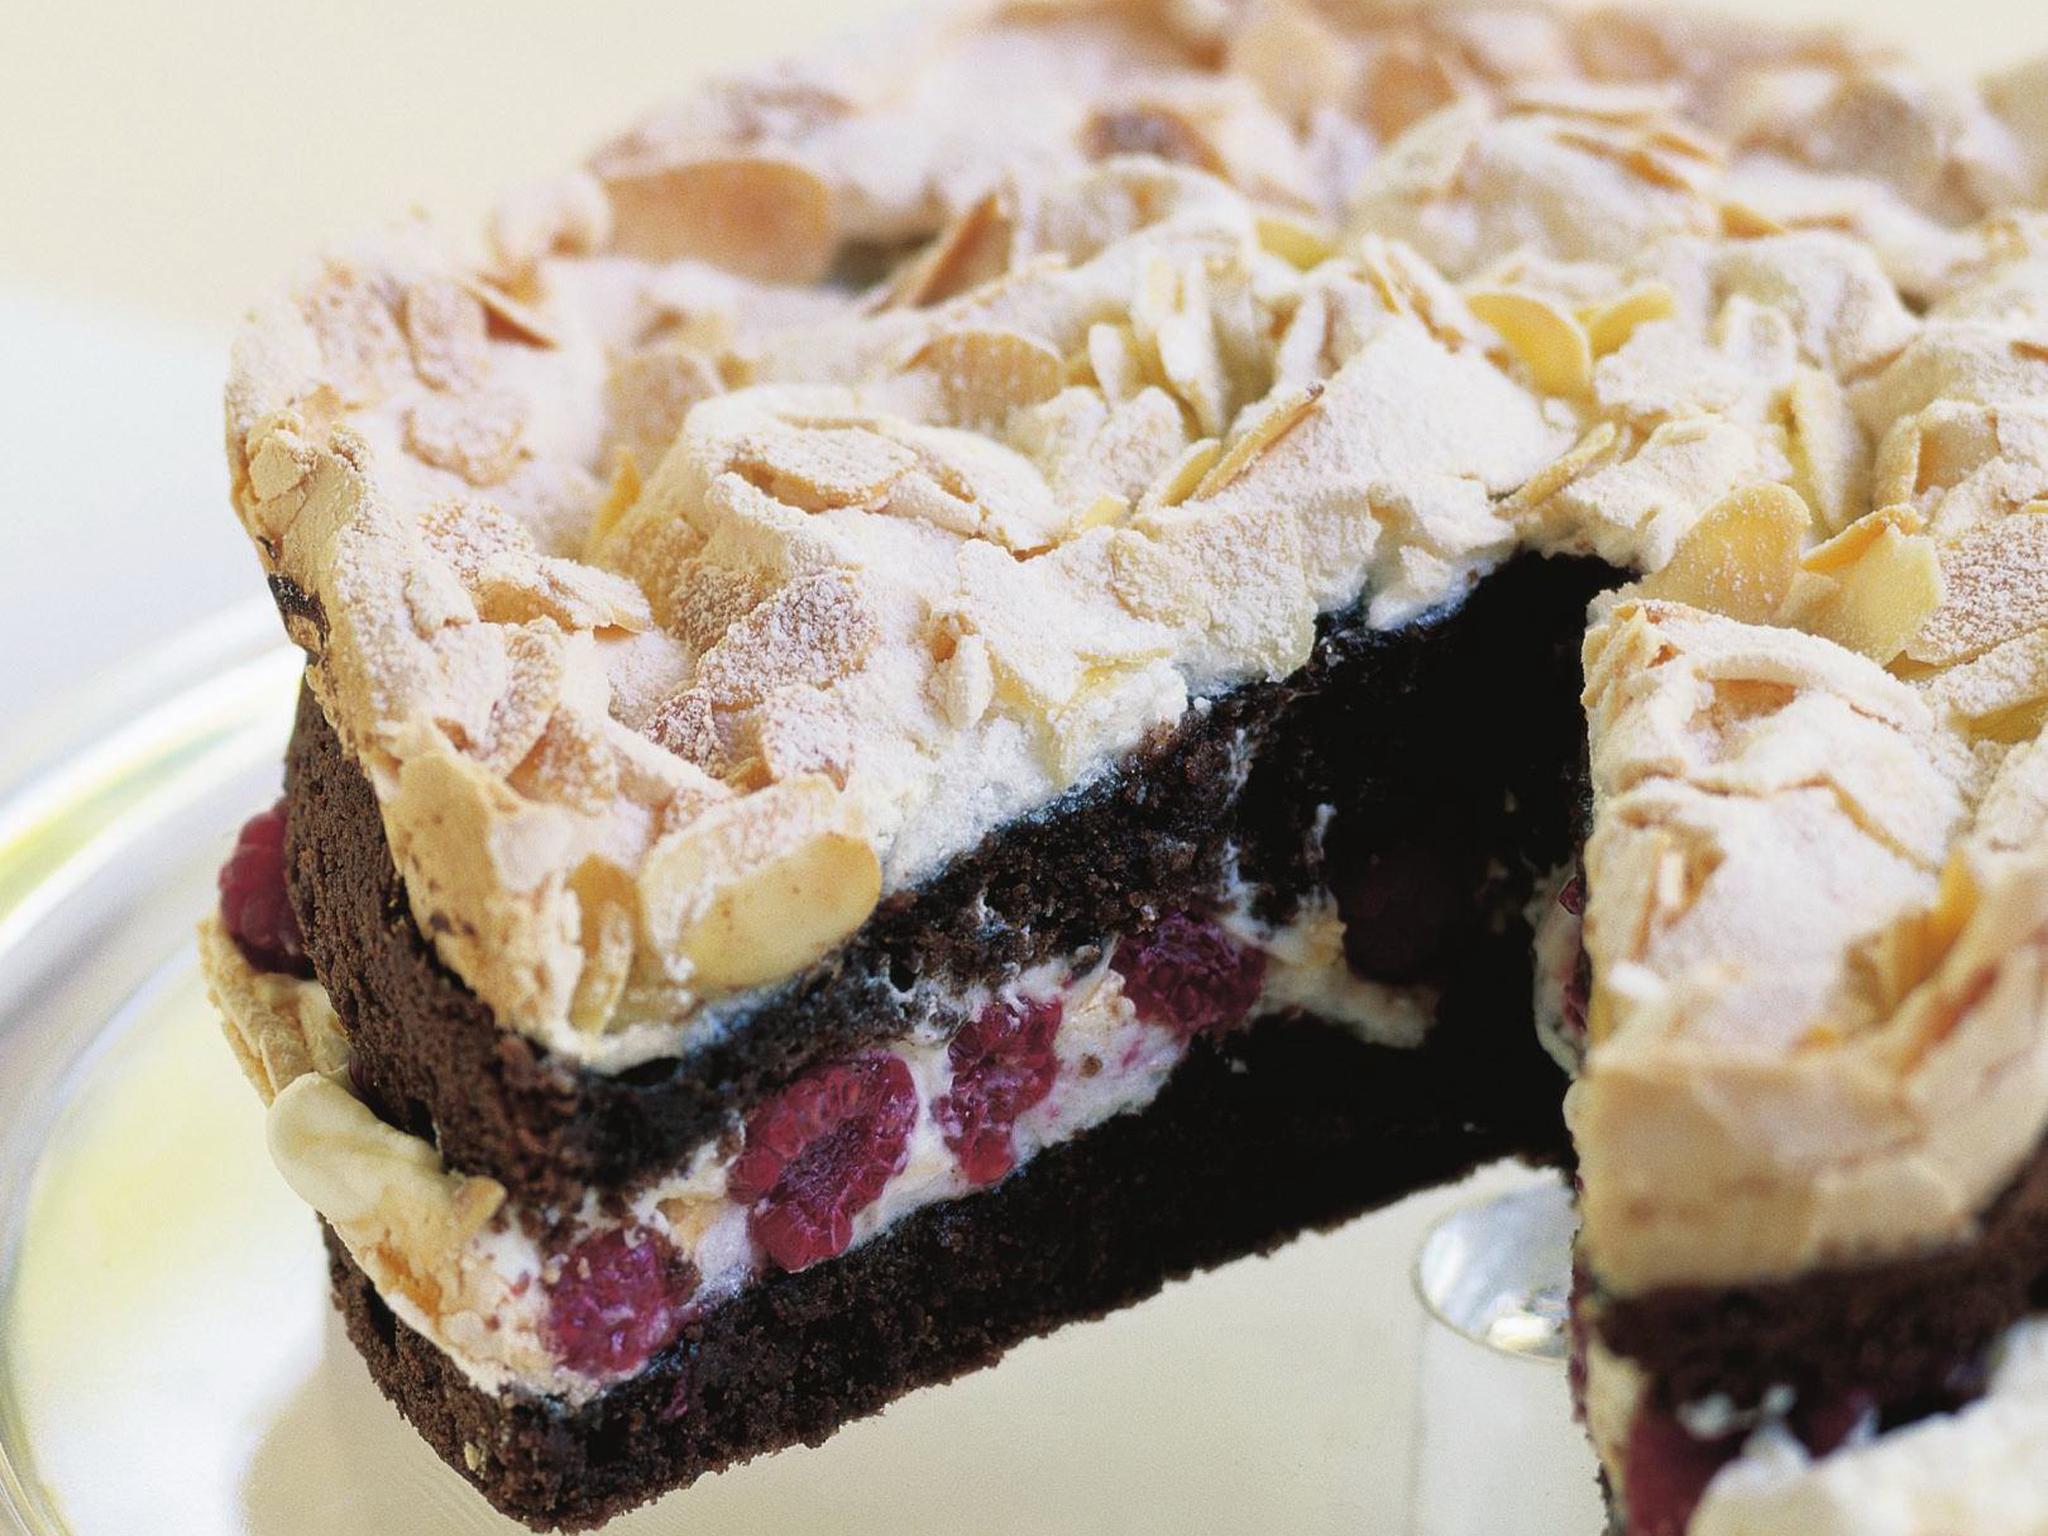 Watch Raspberry and Meringue Cake video